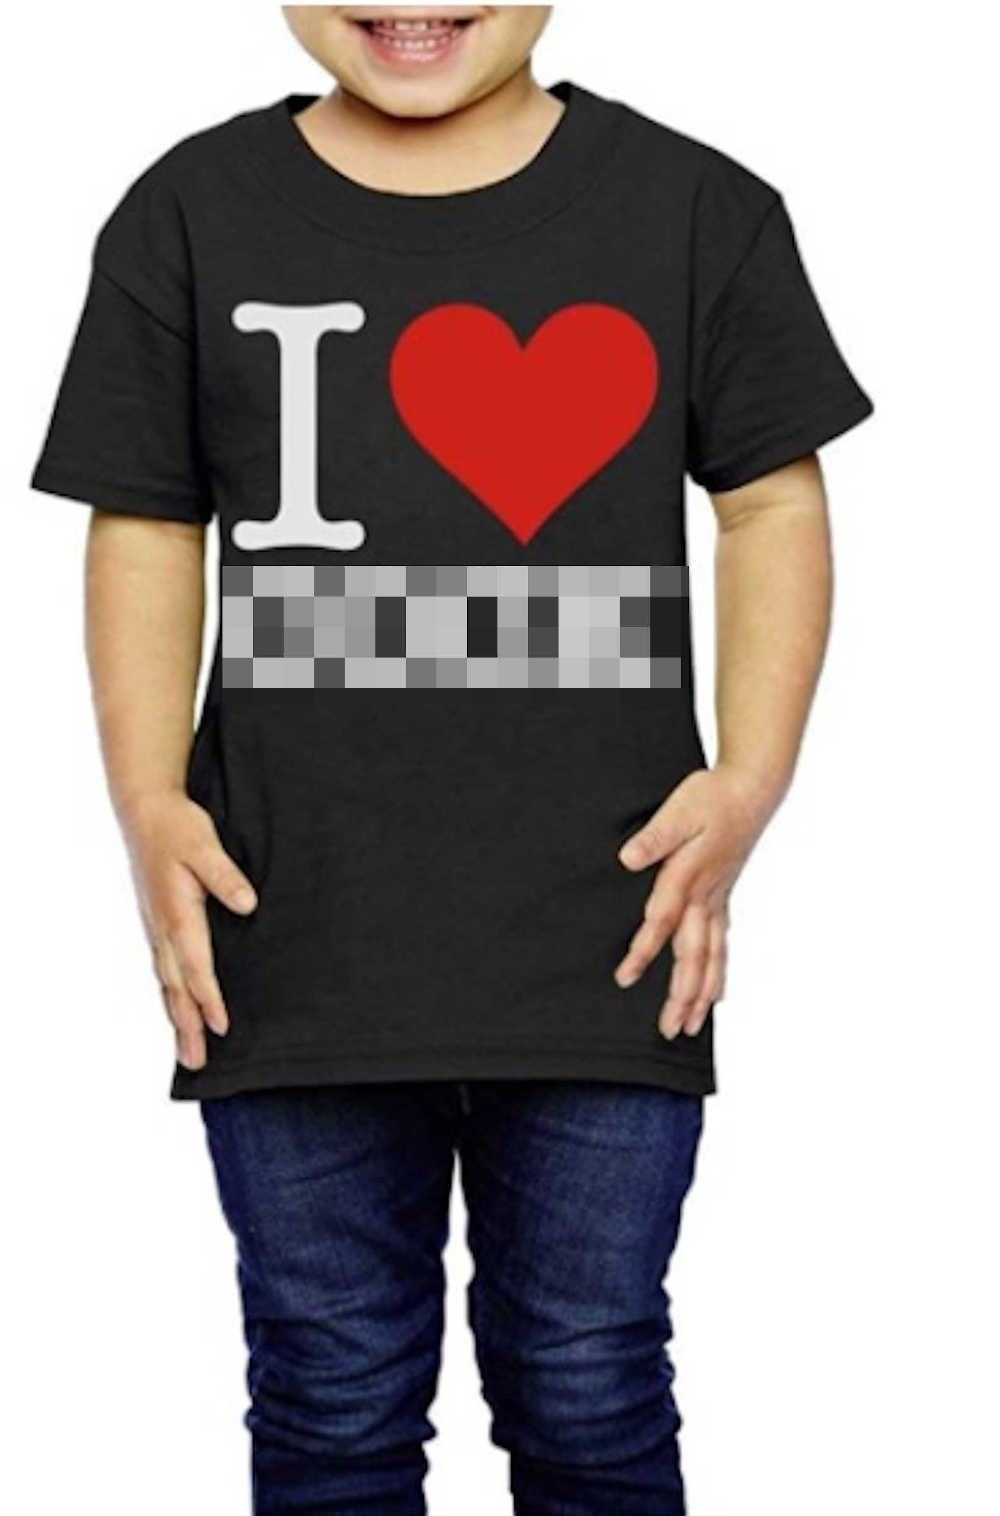 Boy wearing Amazon T shirt